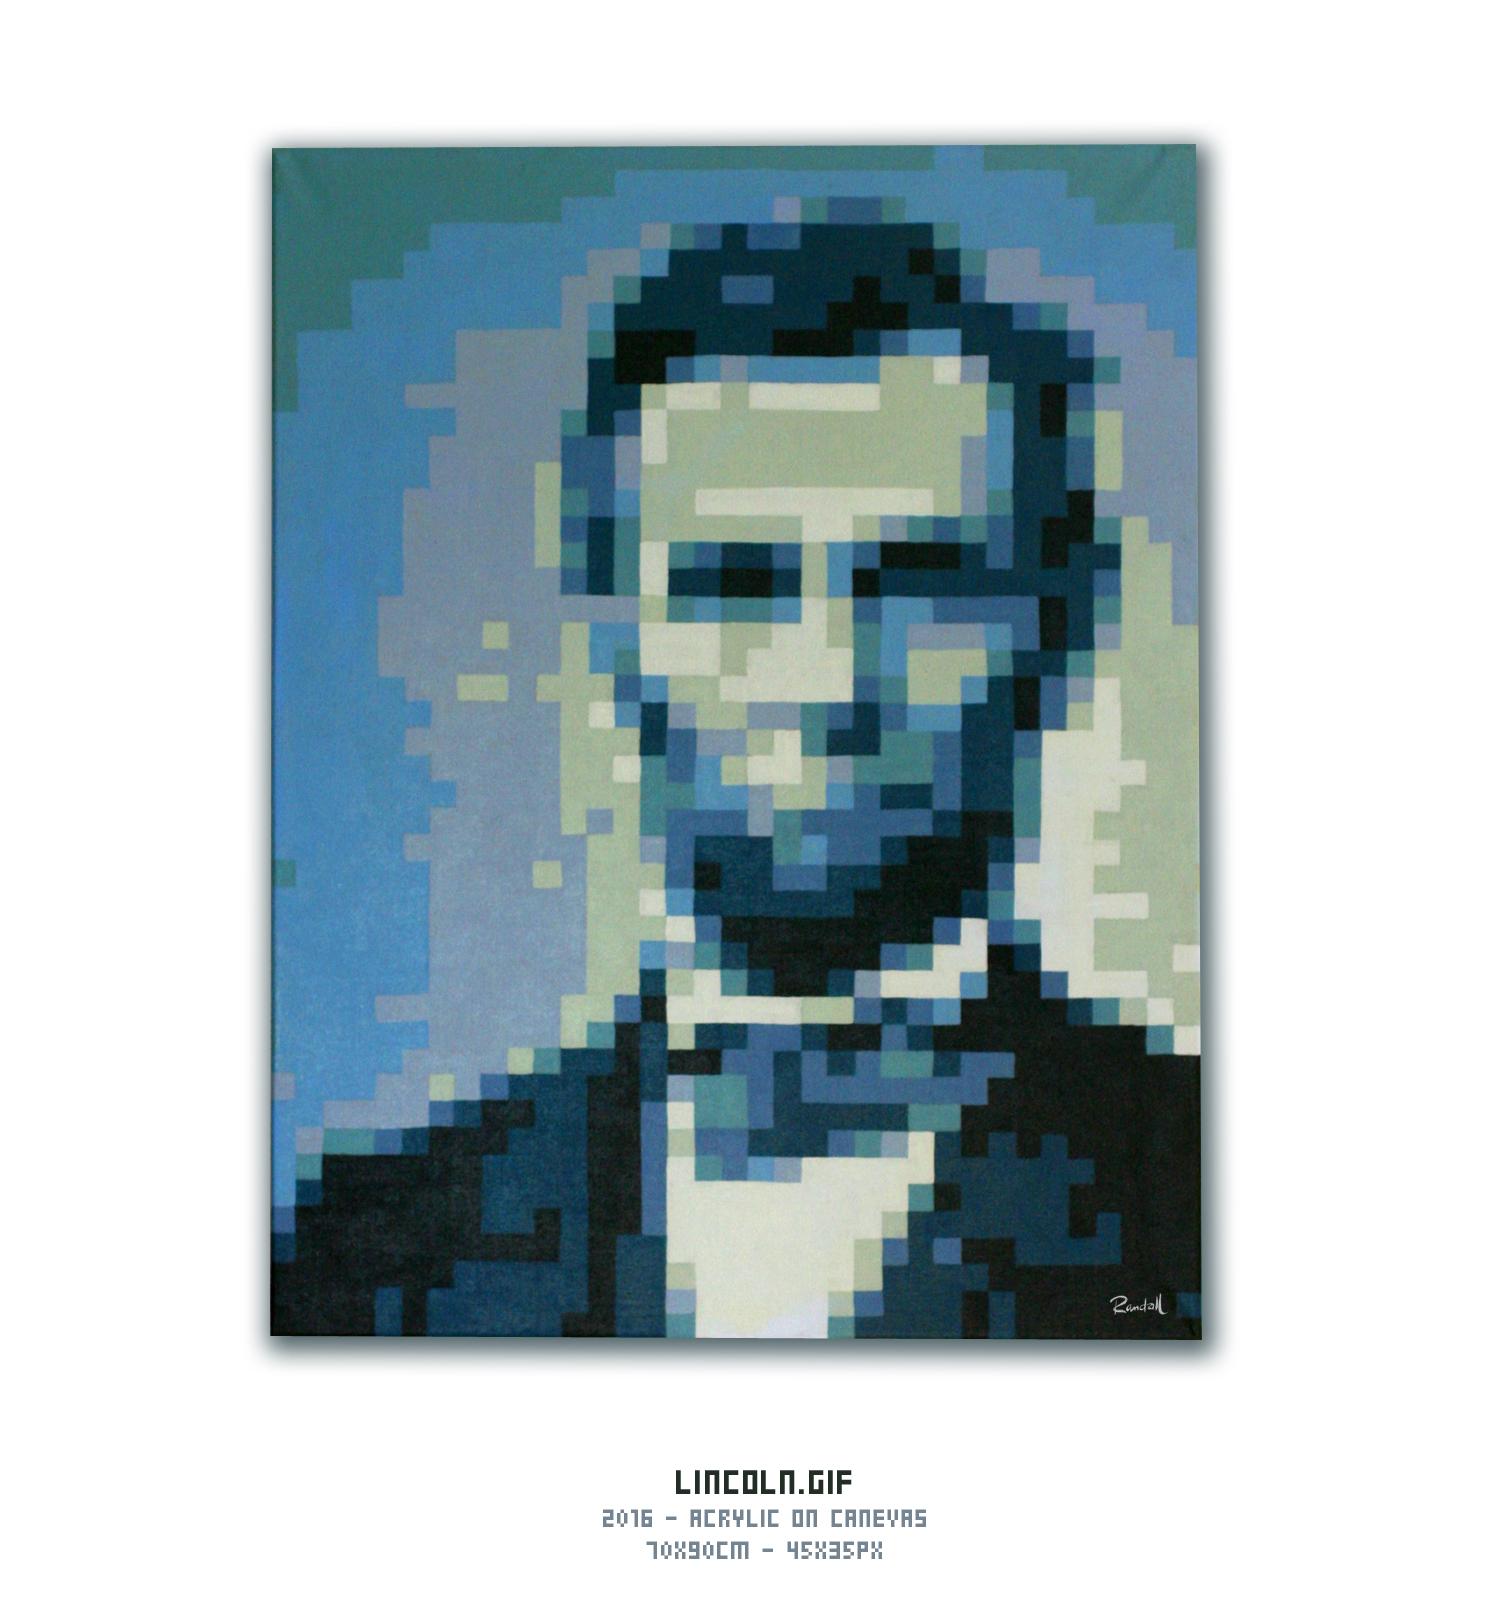 Lincoln_45x35